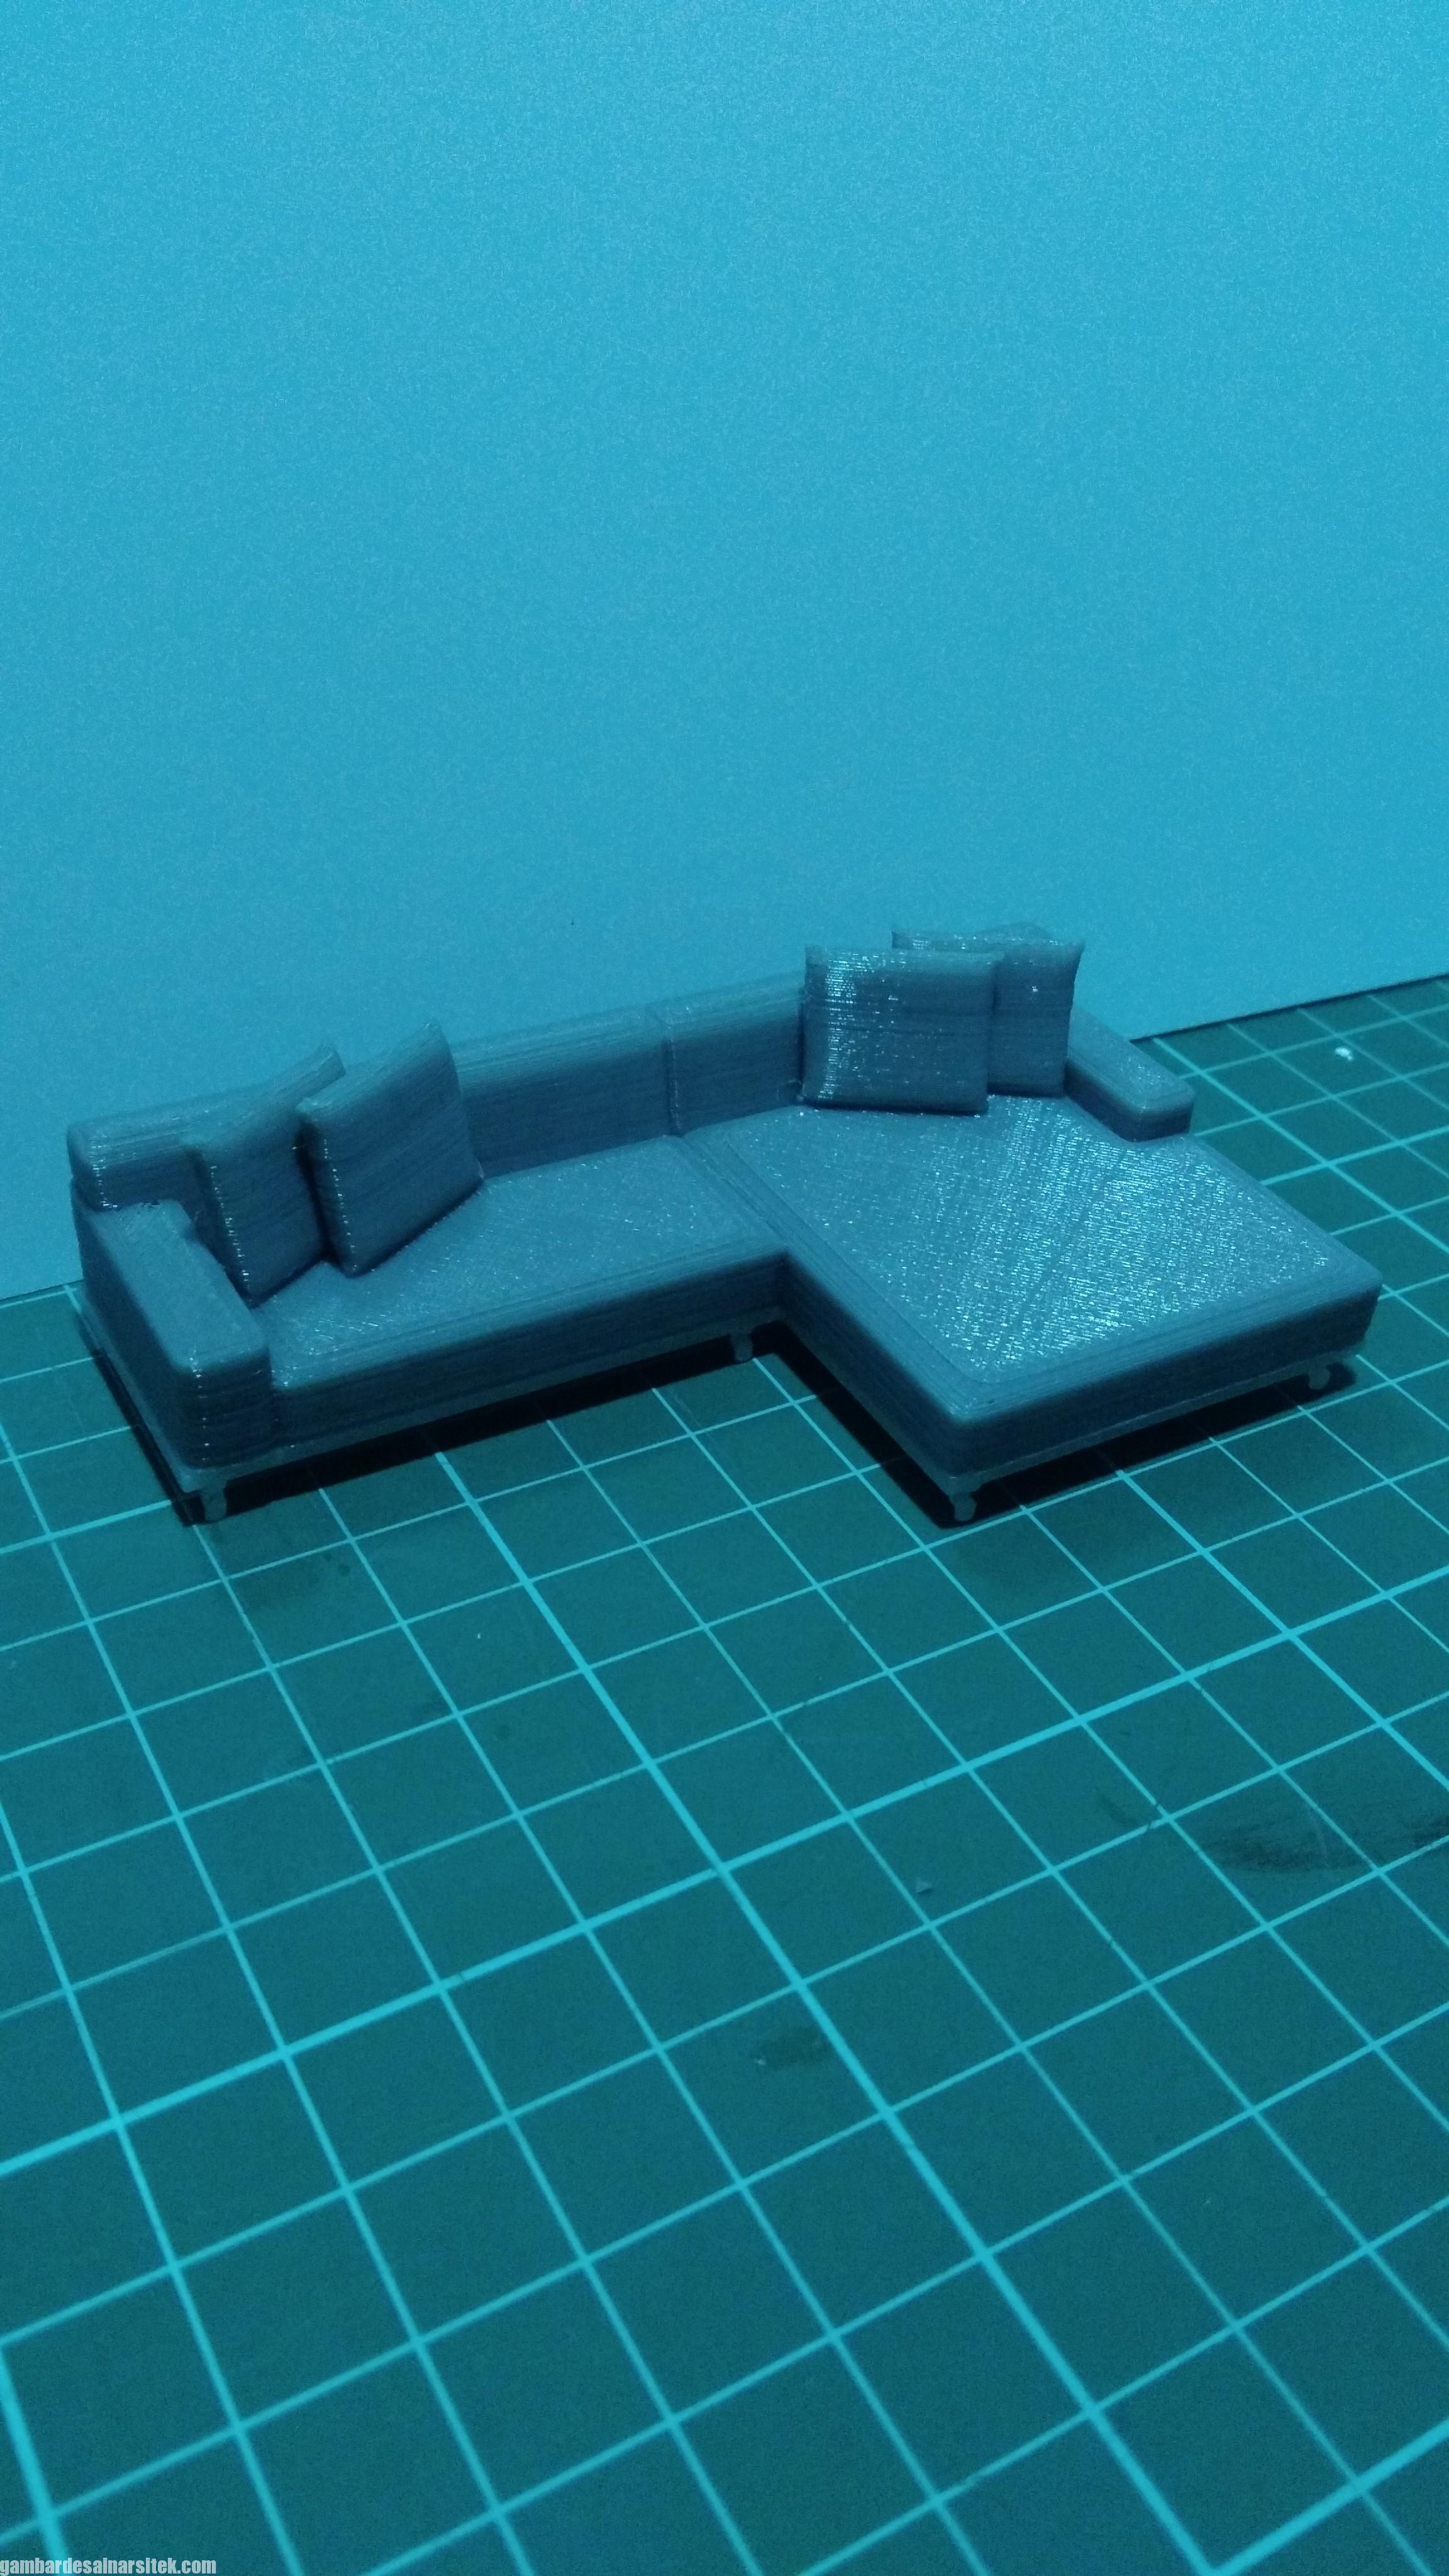 Maket Arsitektur Miniatur Model 39 Bahan maket Sofa 1-30 (3)